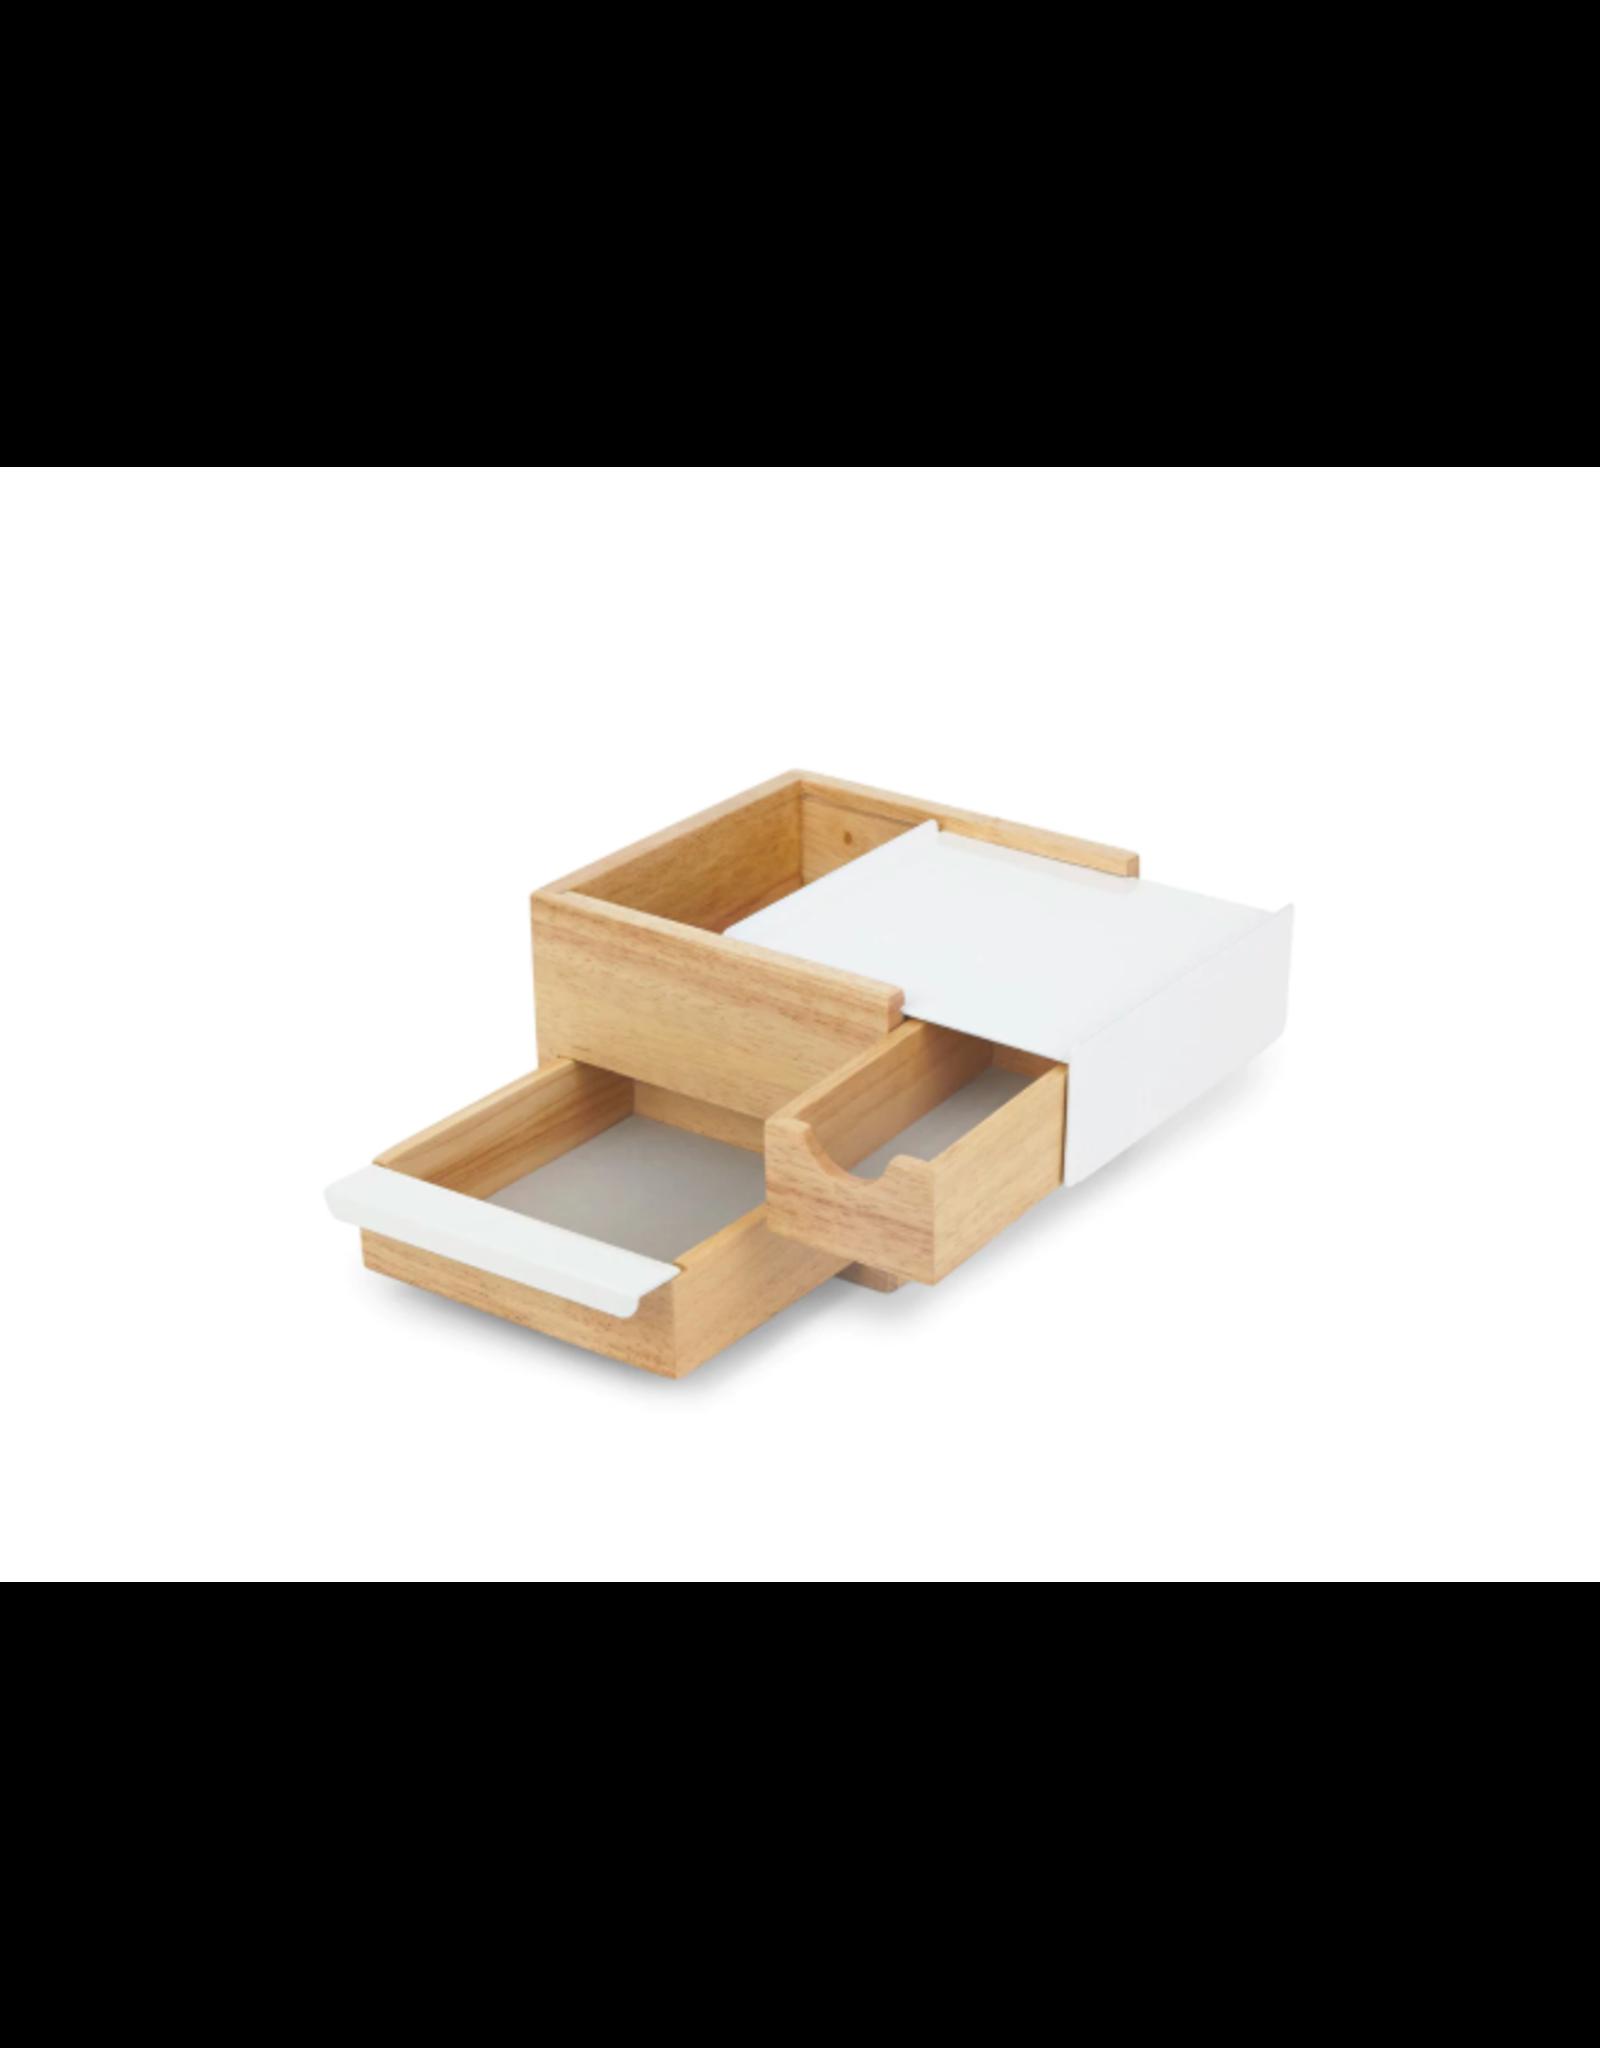 Umbra jewelry box - stowit (white/natural)